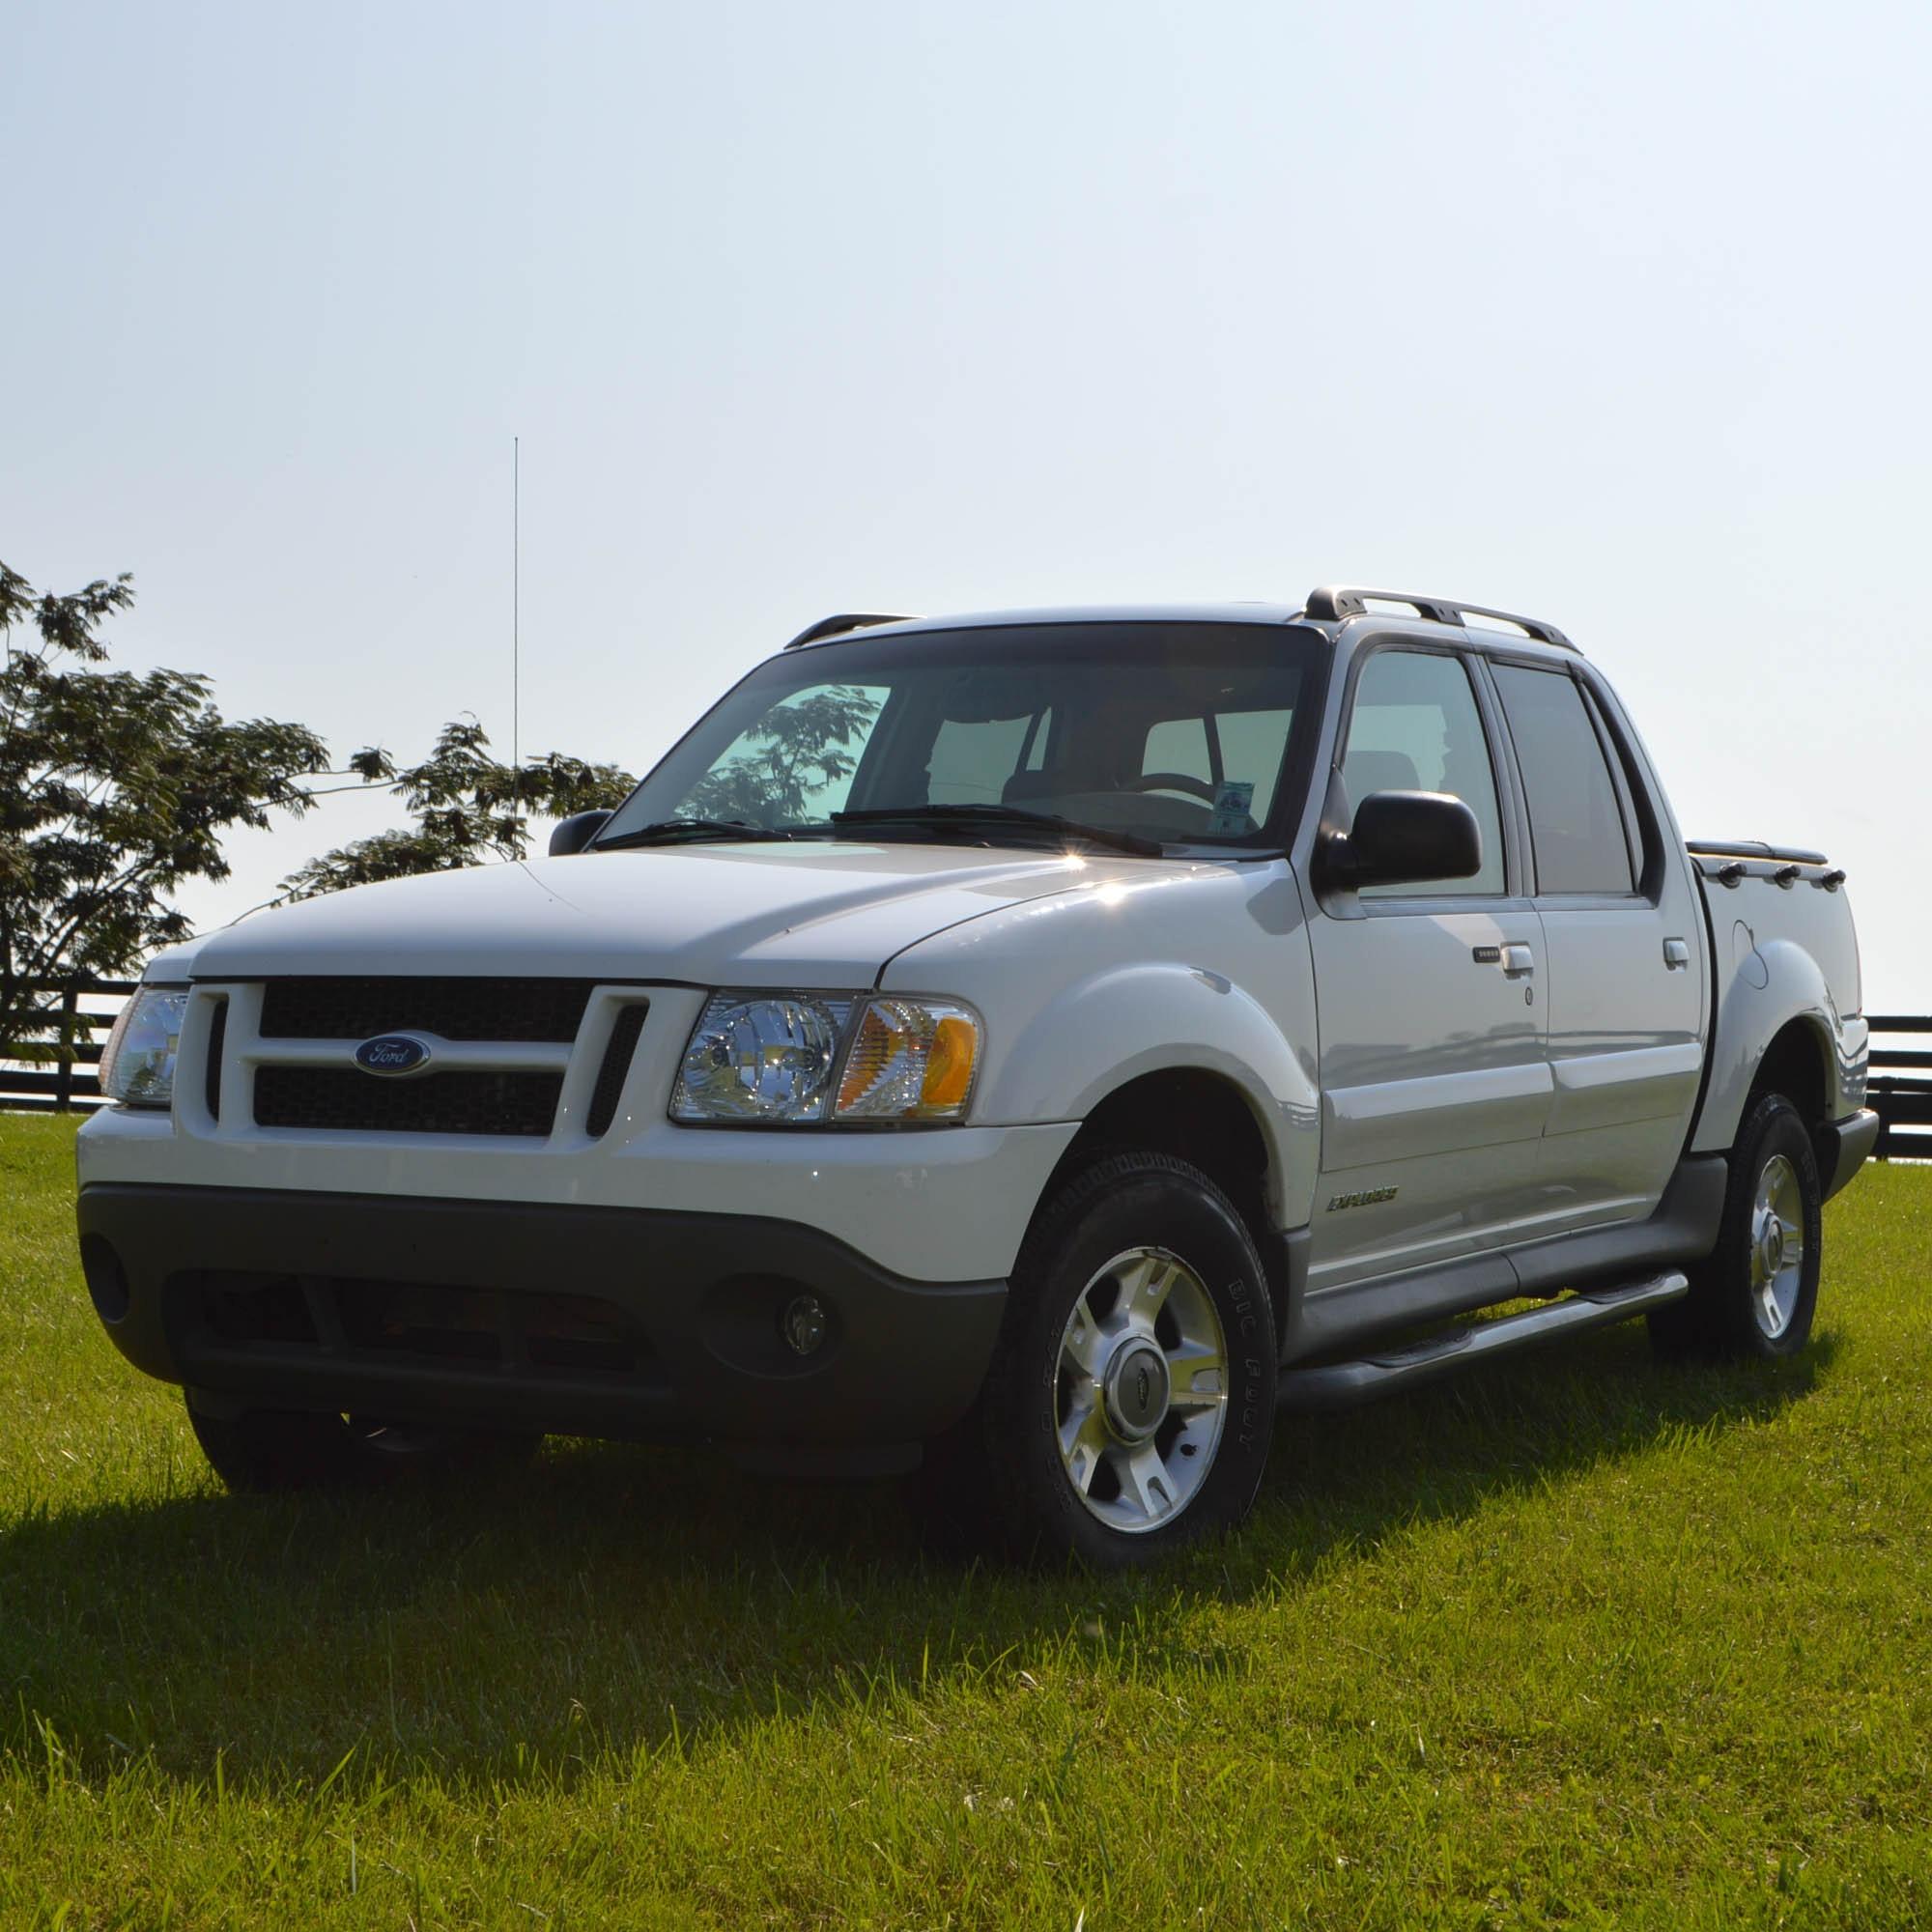 2002 Ford Explorer Sport Trac Pickup Truck